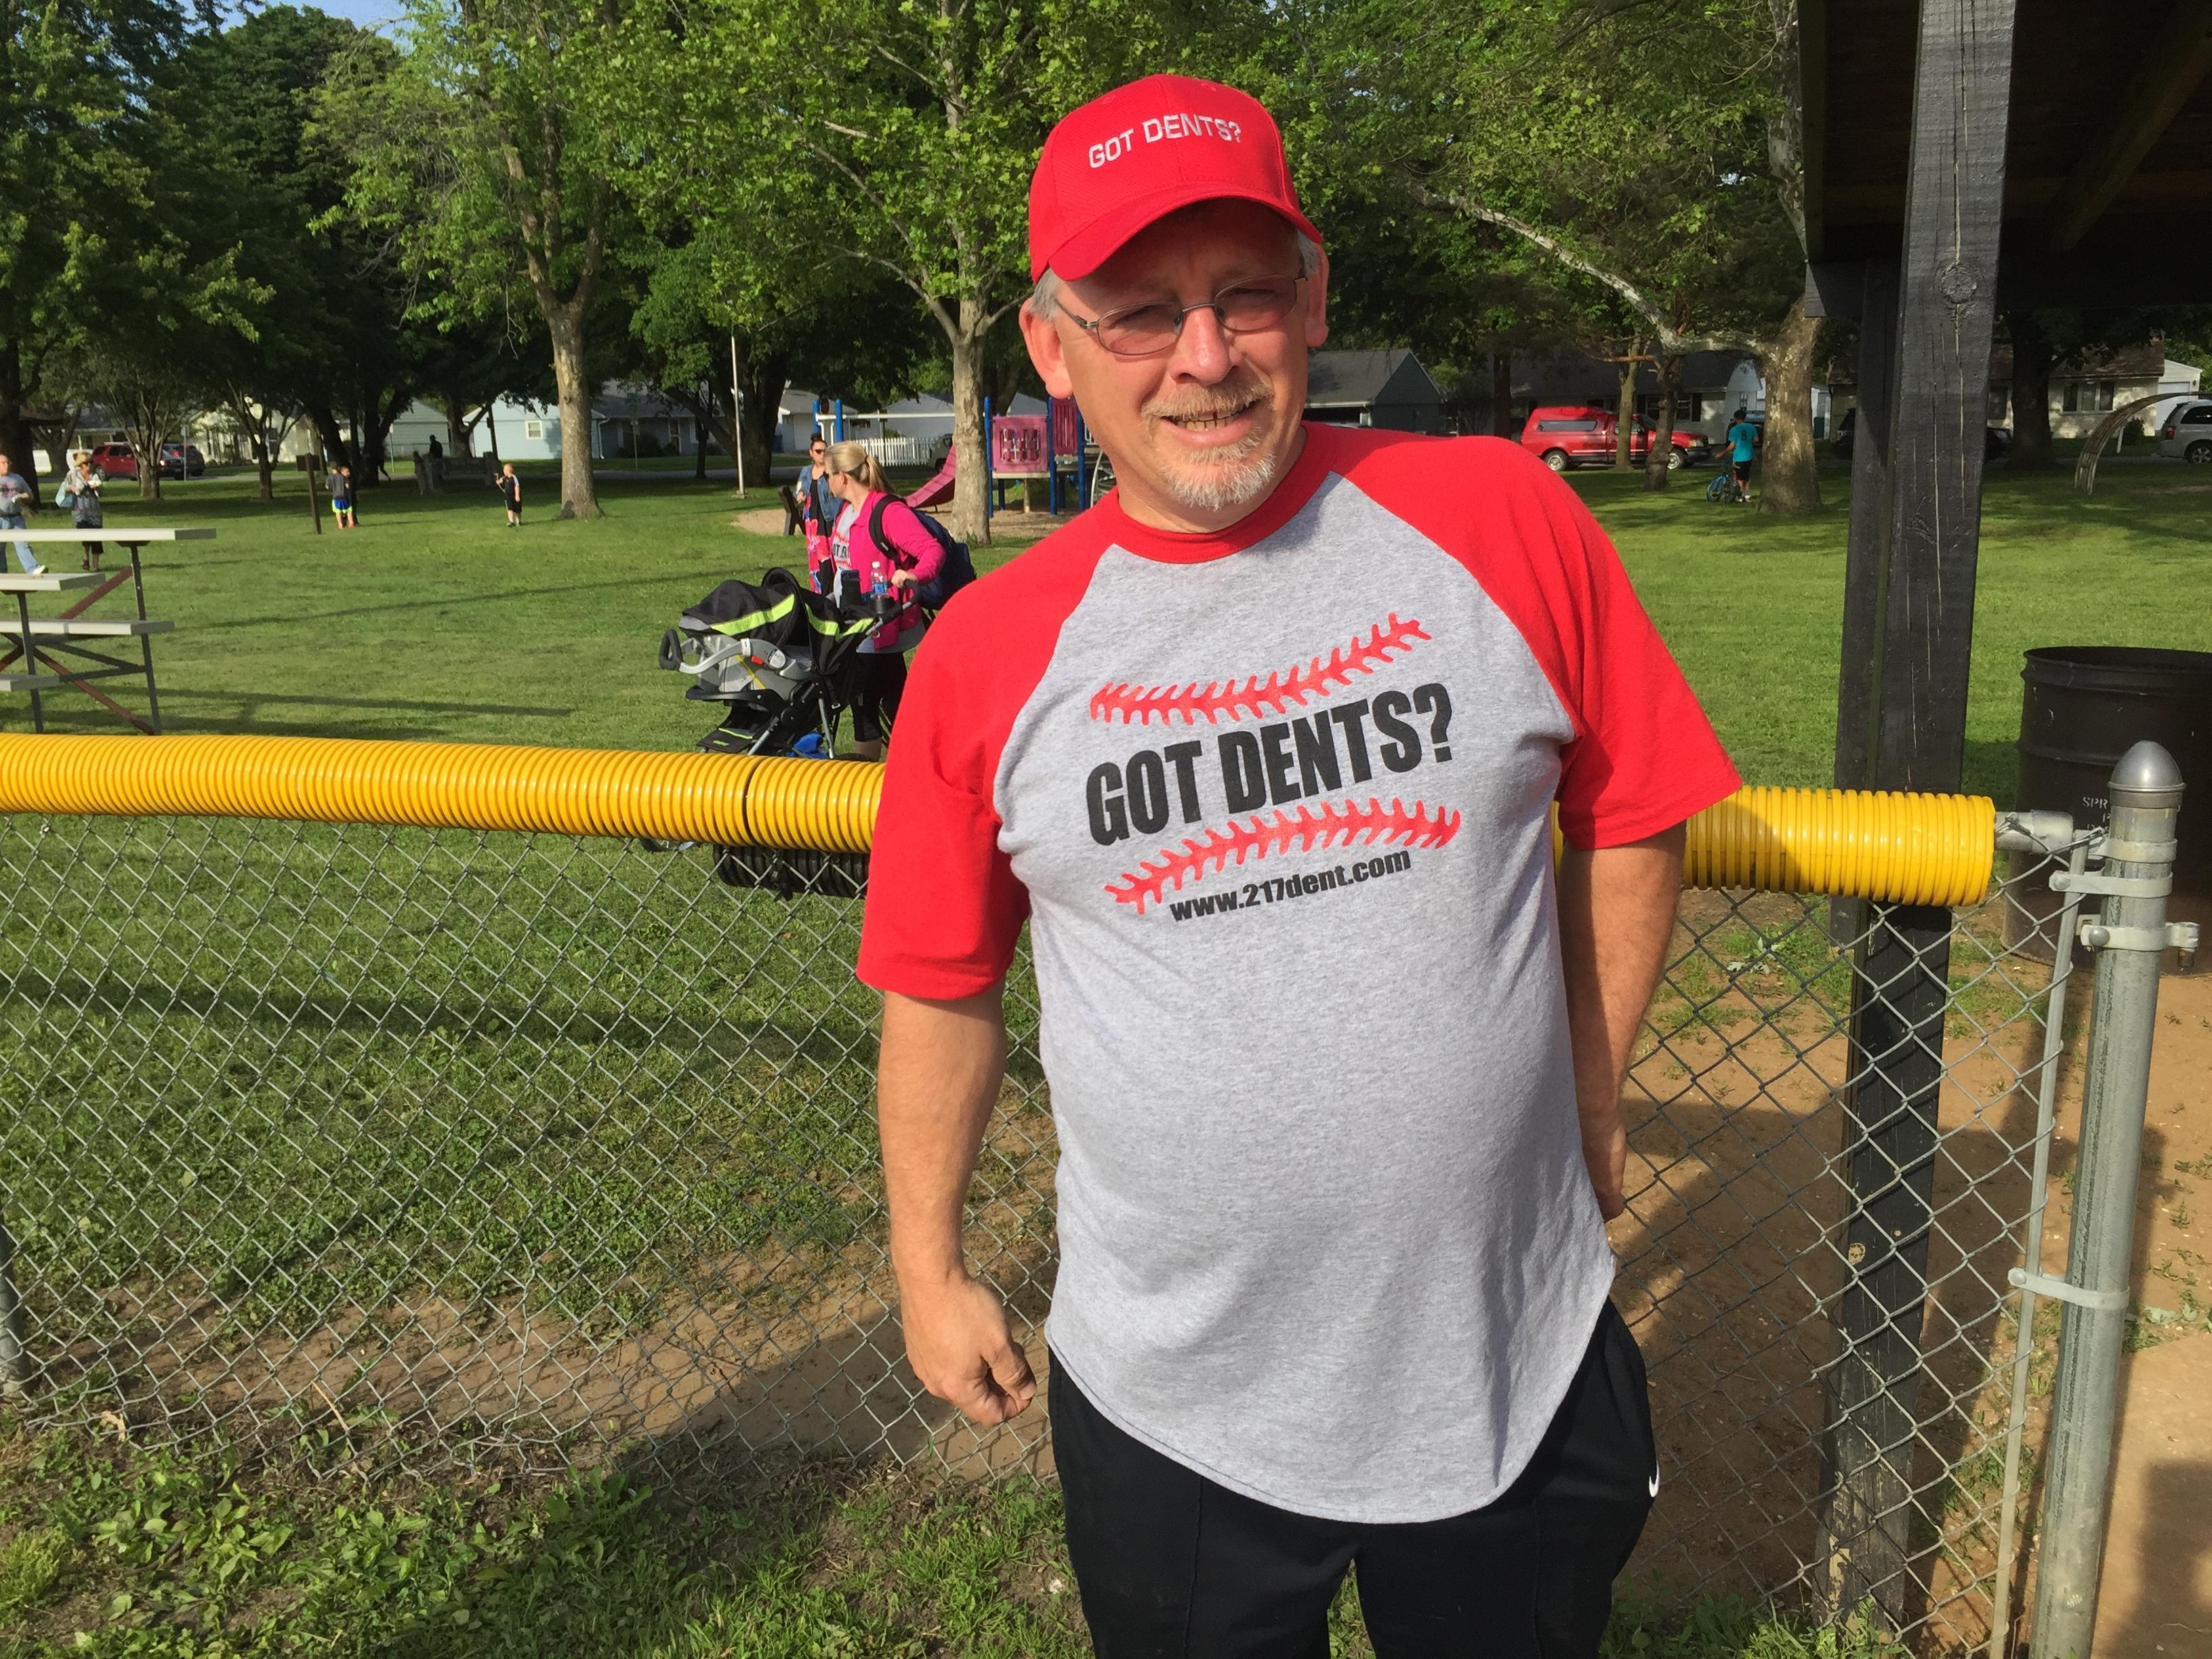 HTTP://217DENT.COM Got Dents Head Coach, Springfield, Illinois